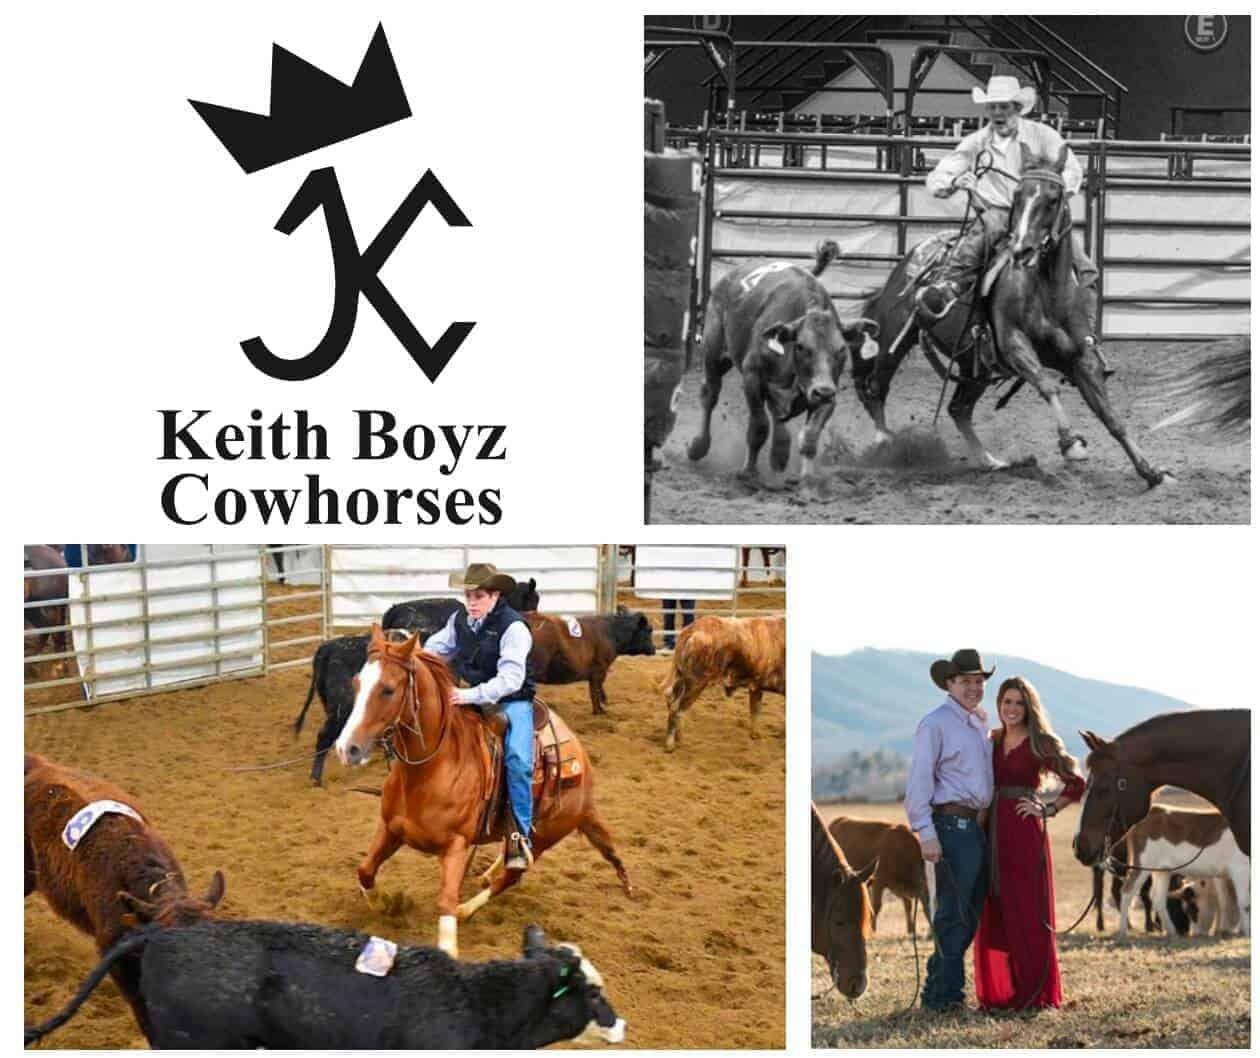 Keith Boyz Cowhorses